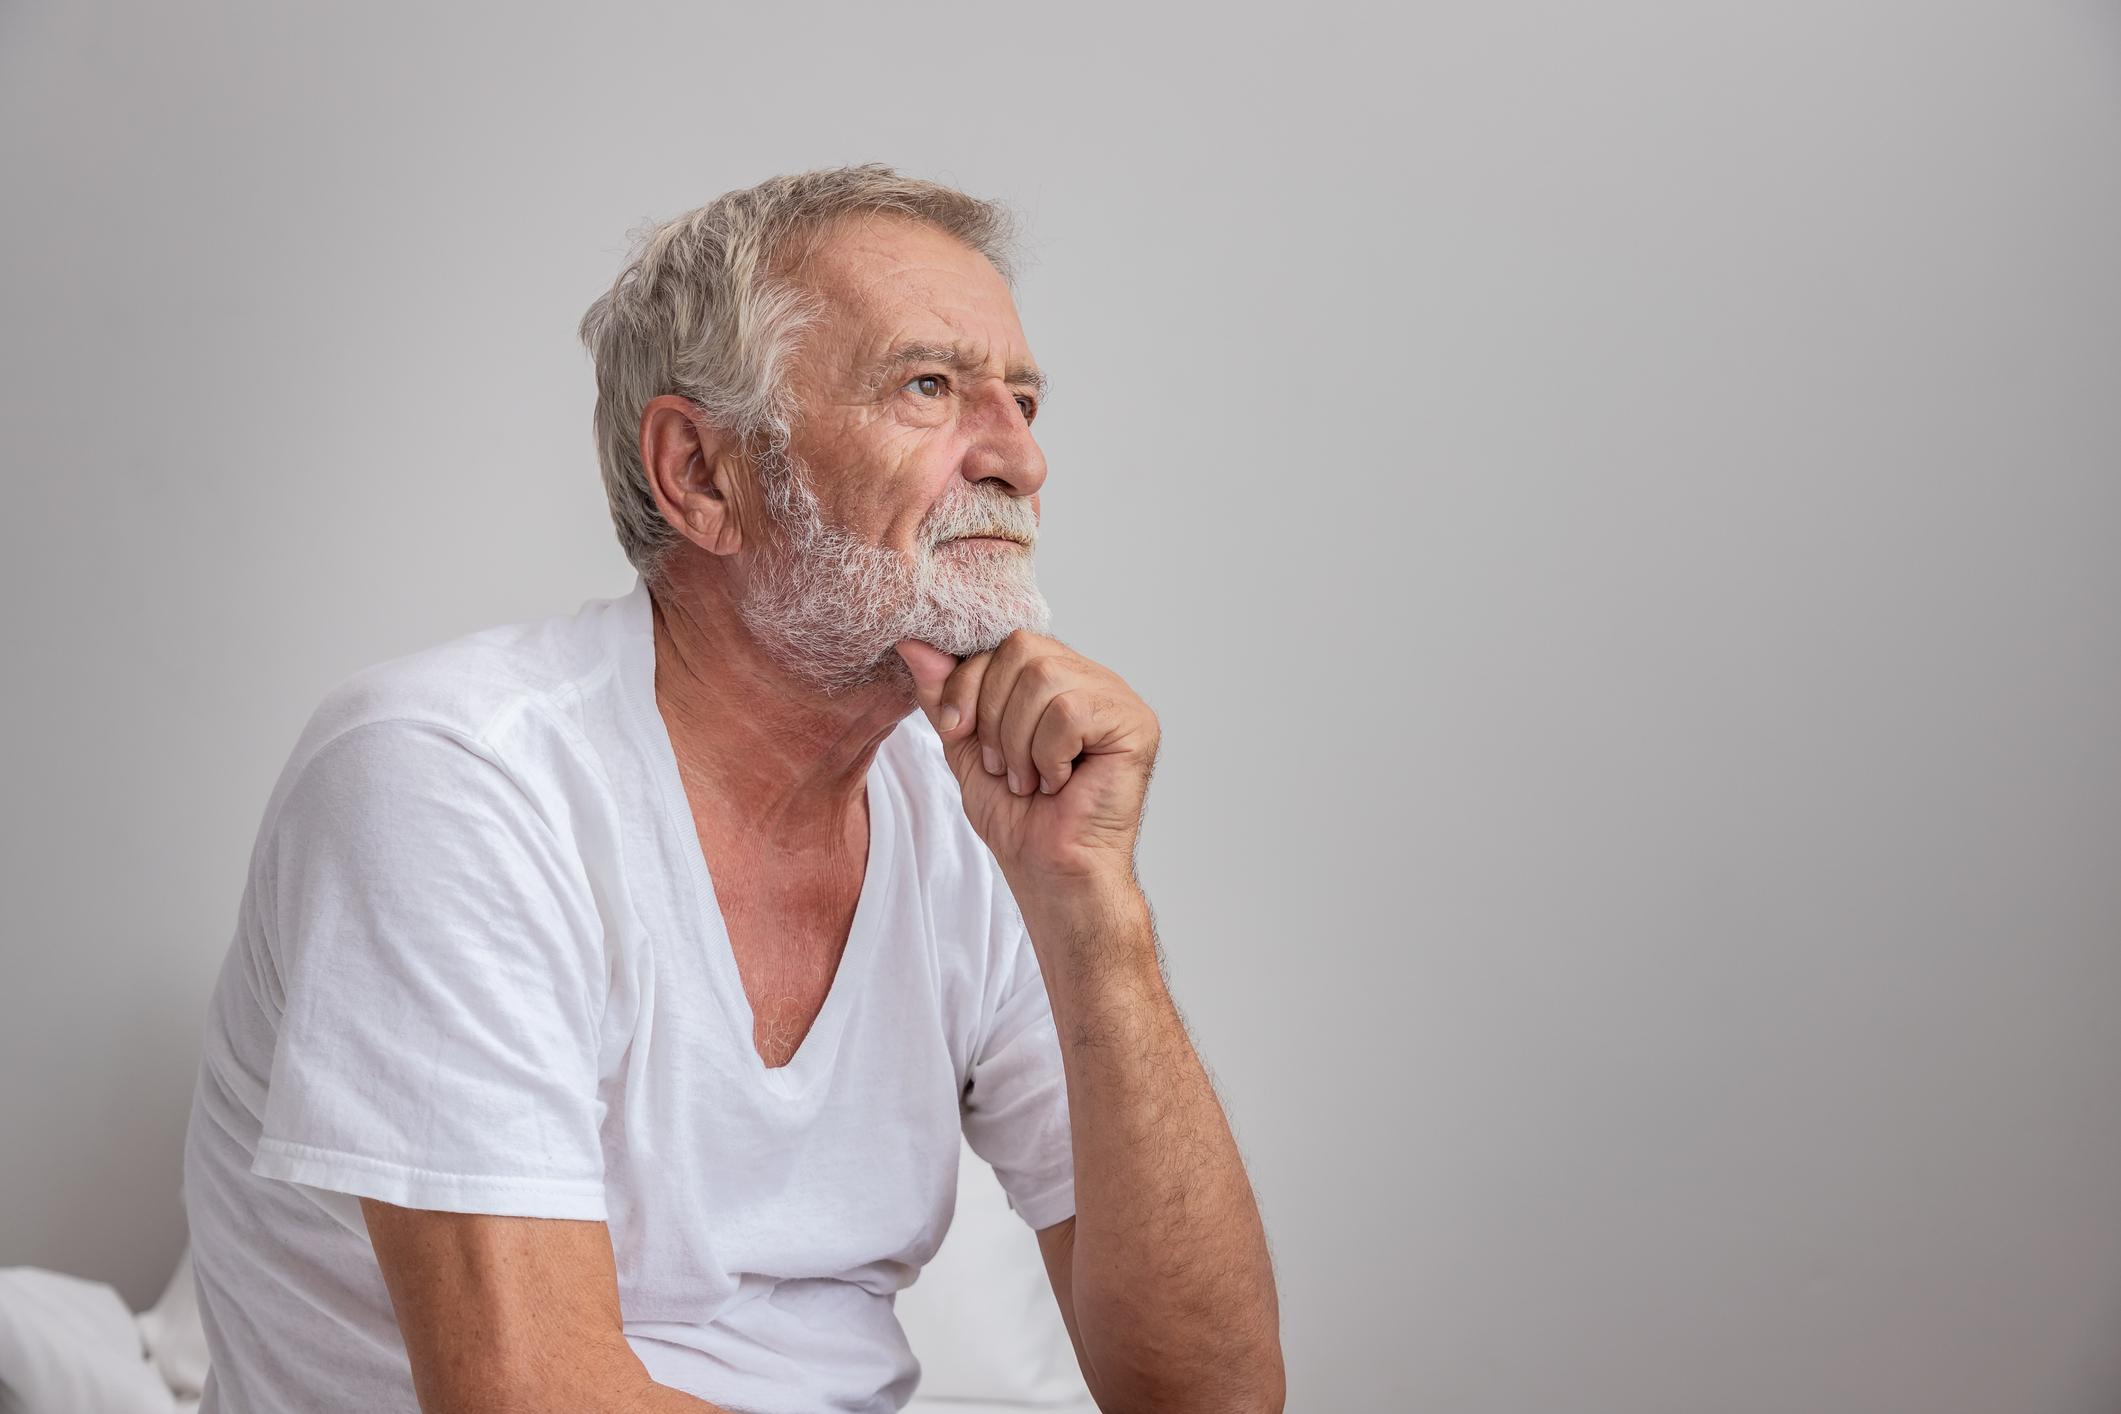 Will the Coronavirus Selloff Ruin Your Retirement? | The Motley Fool